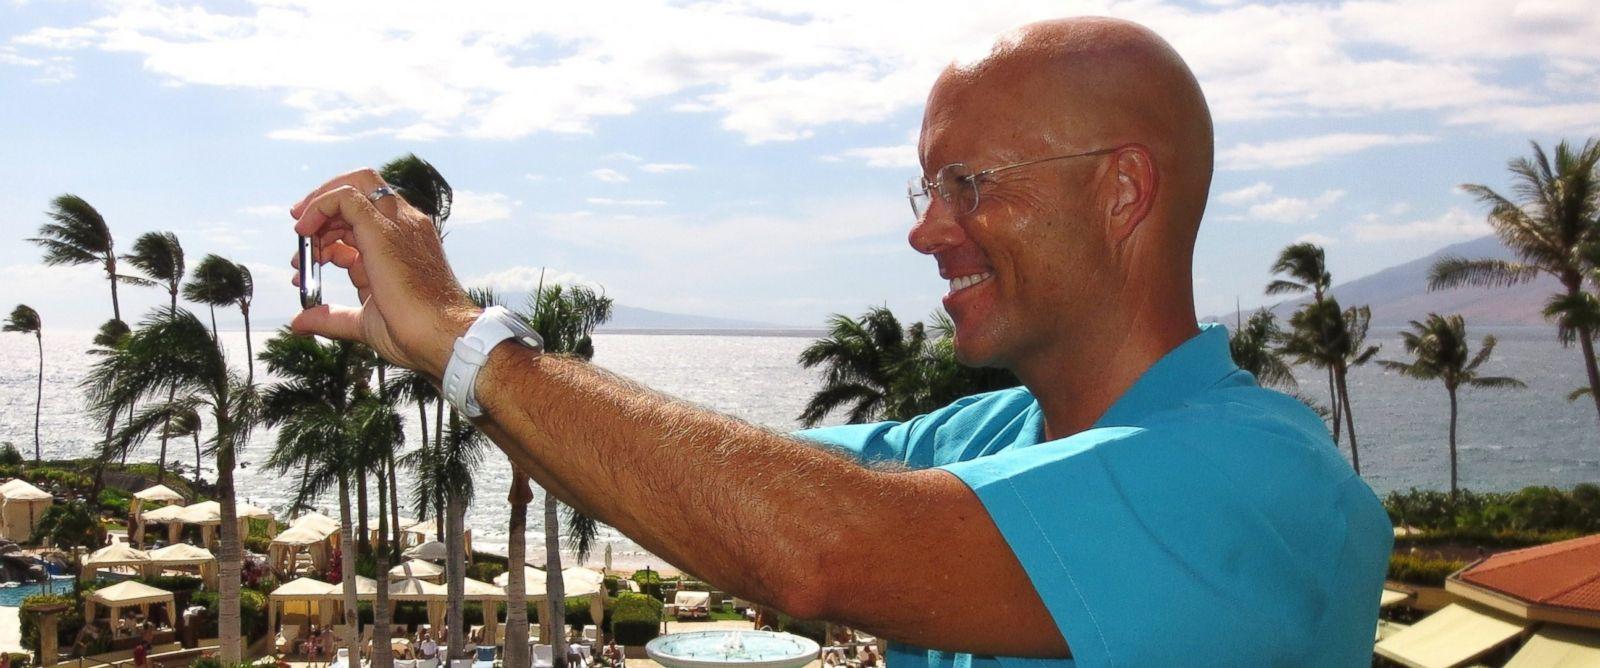 PHOTO: Scott Miles is the Four Seasons Resort, Mauis Photo Ambassador.